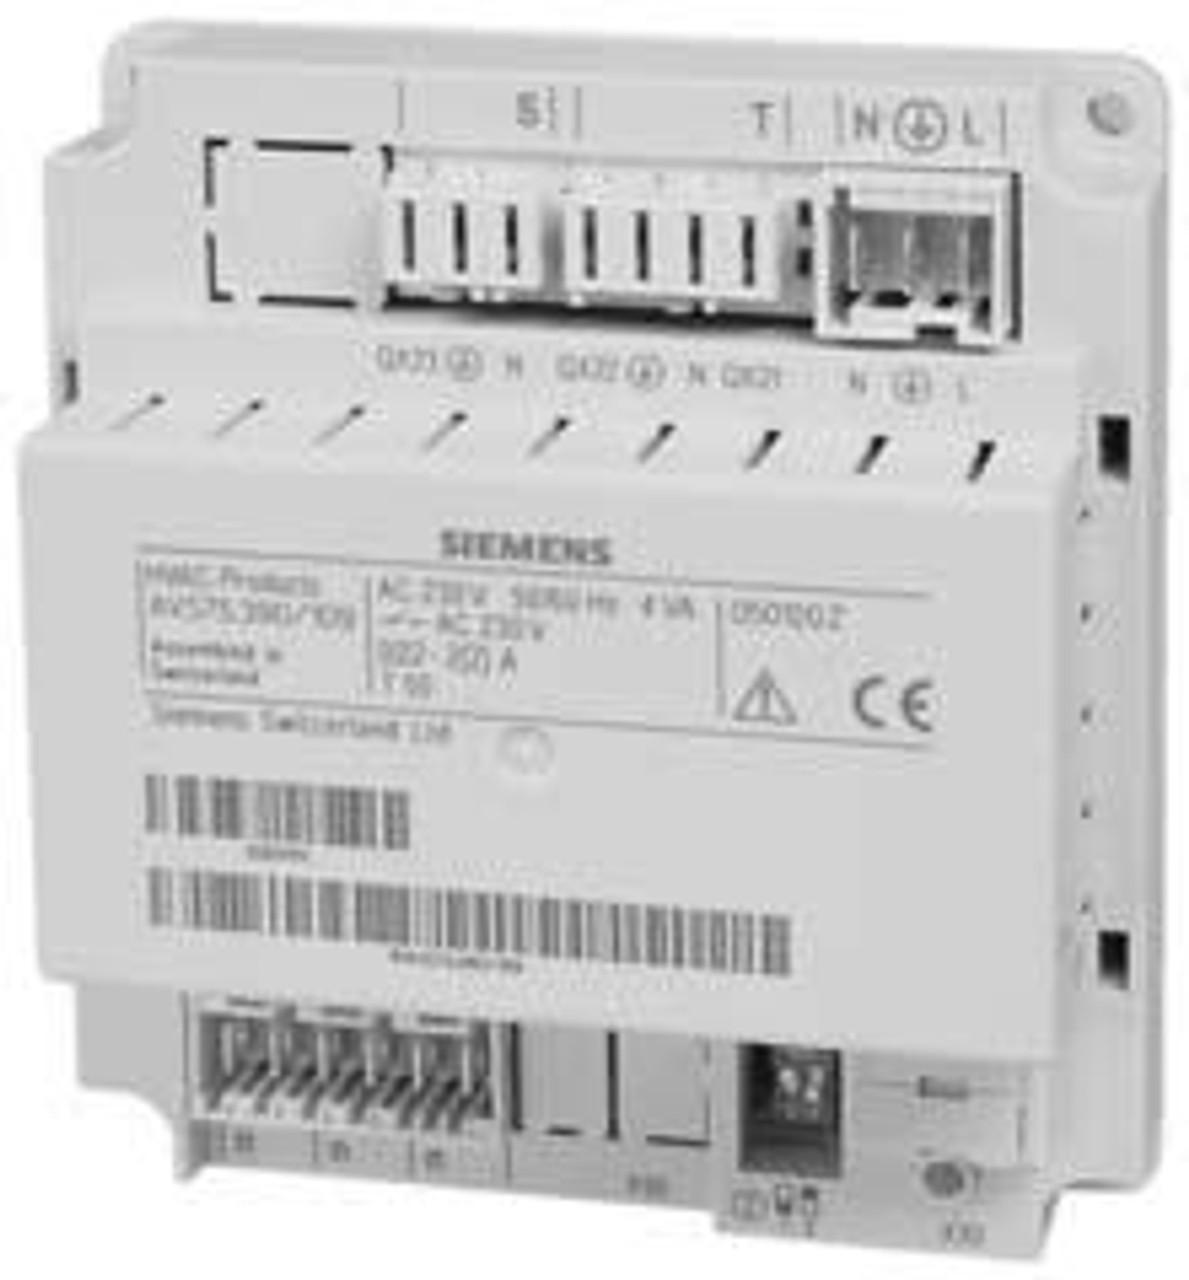 Siemens RVS46.530/101